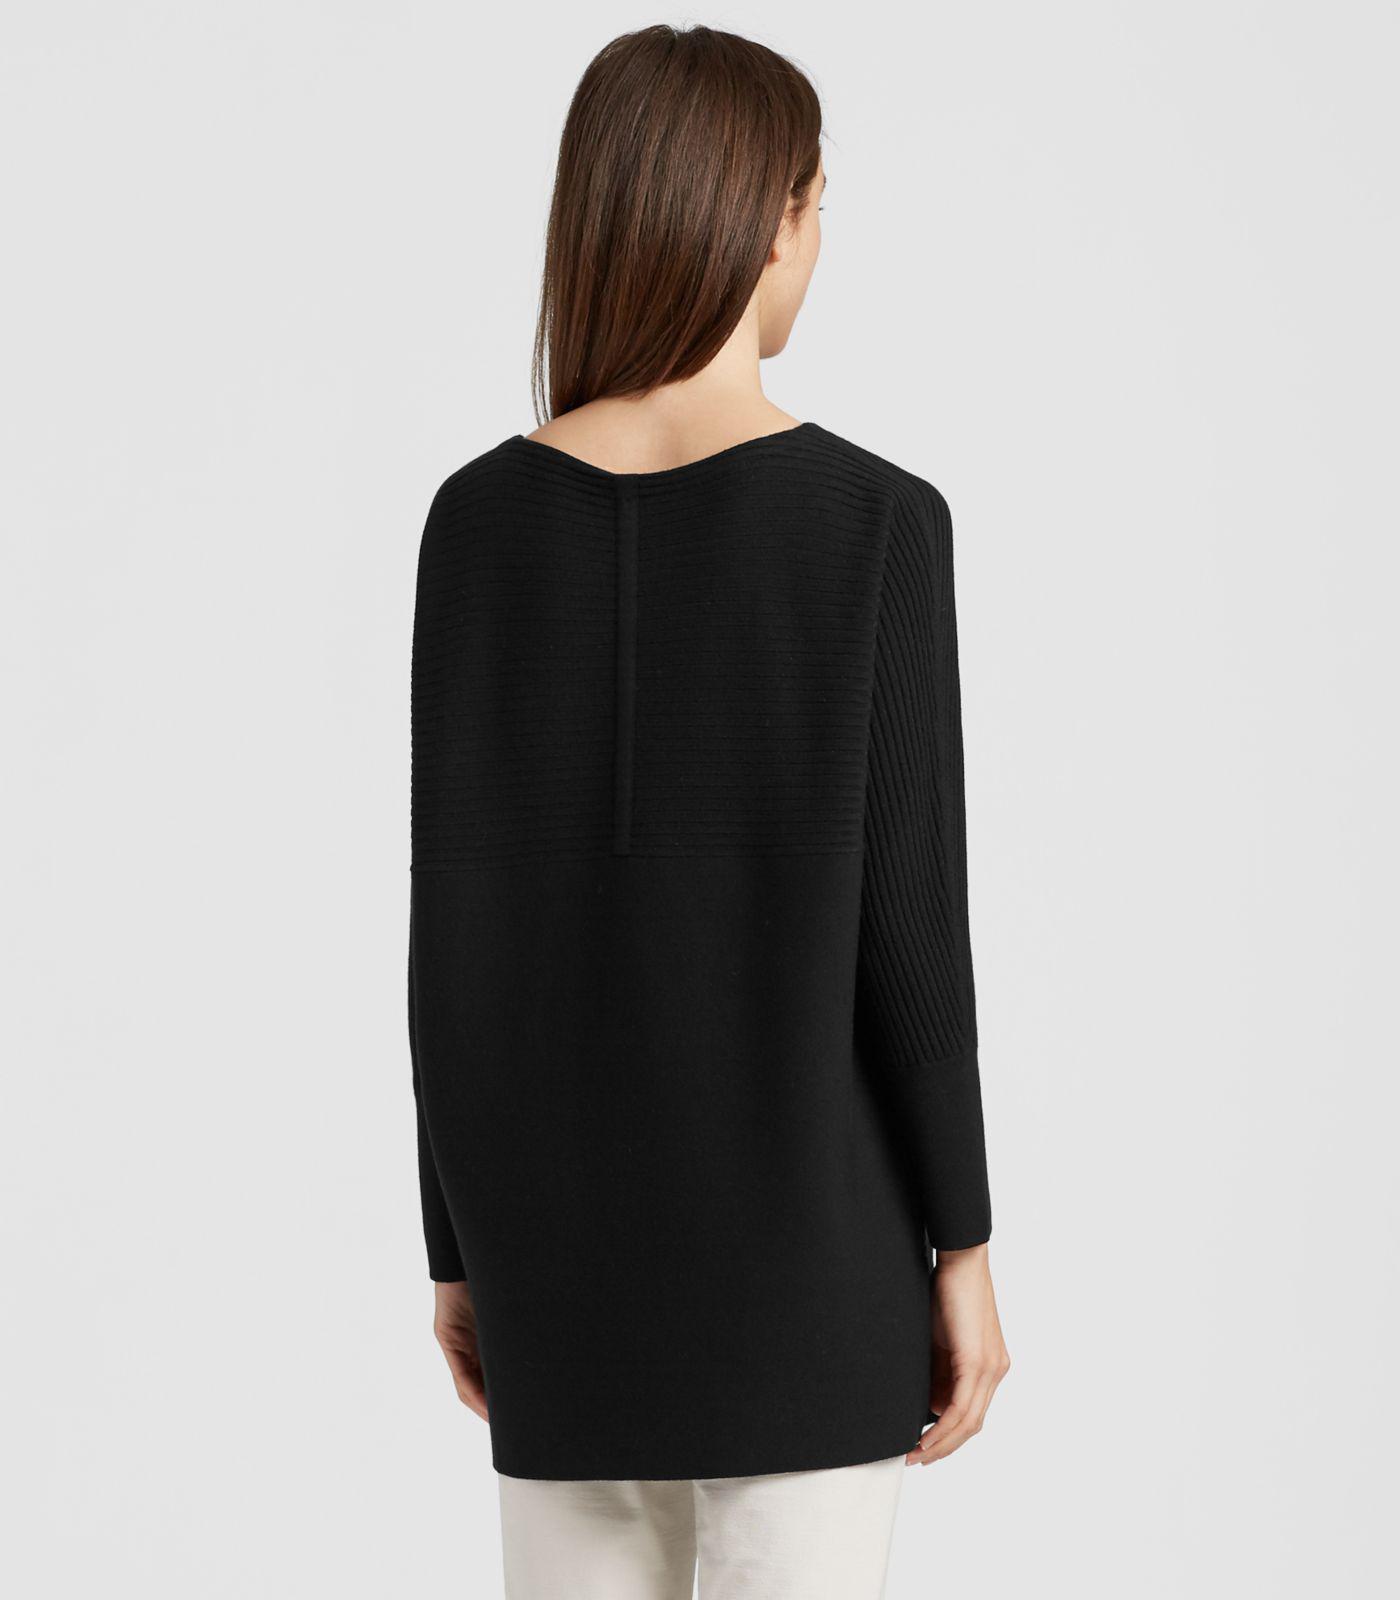 620f334625bf85 Lyst - Eileen Fisher Luxe Merino Stretch Tunic in Black